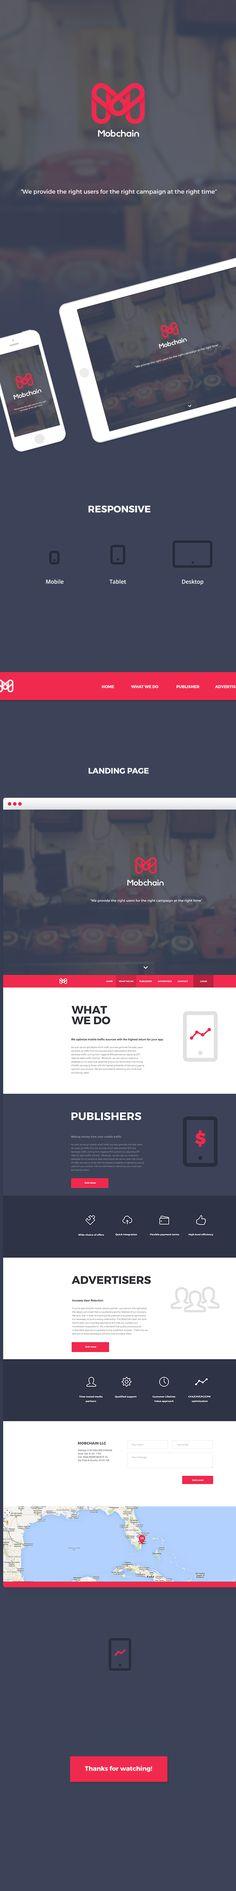 Mobchain on Behance